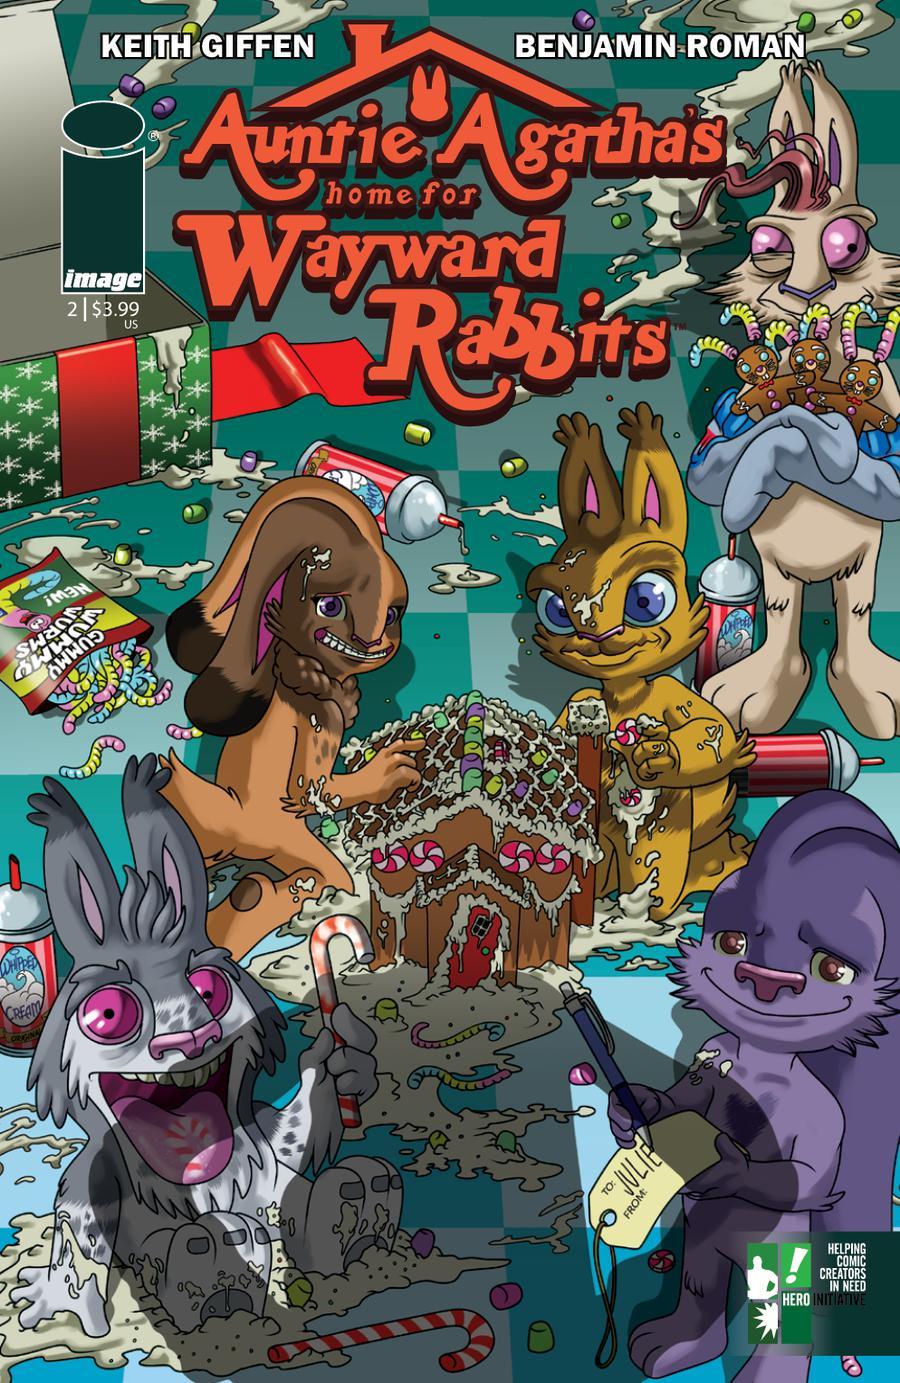 Auntie Agathas Home For Wayward Rabbits #2 Cover B Variant Benjamin Roman Hero Initiative Cover